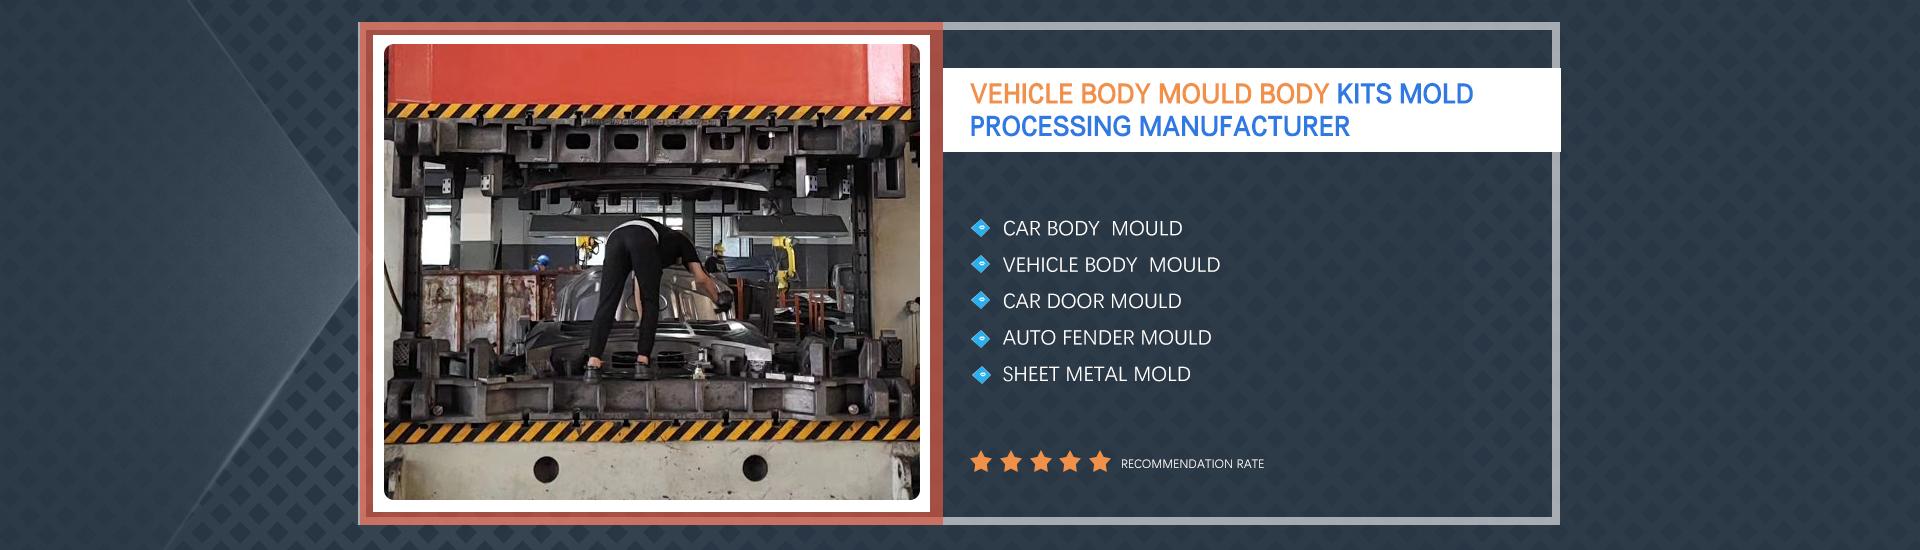 PRO CAR AUTO BODY KIT MODEL 3 S X FRONT REAR FENDER BODY PARTS FOR TESLA MODEL 3 accessories material aluminum front rear fender